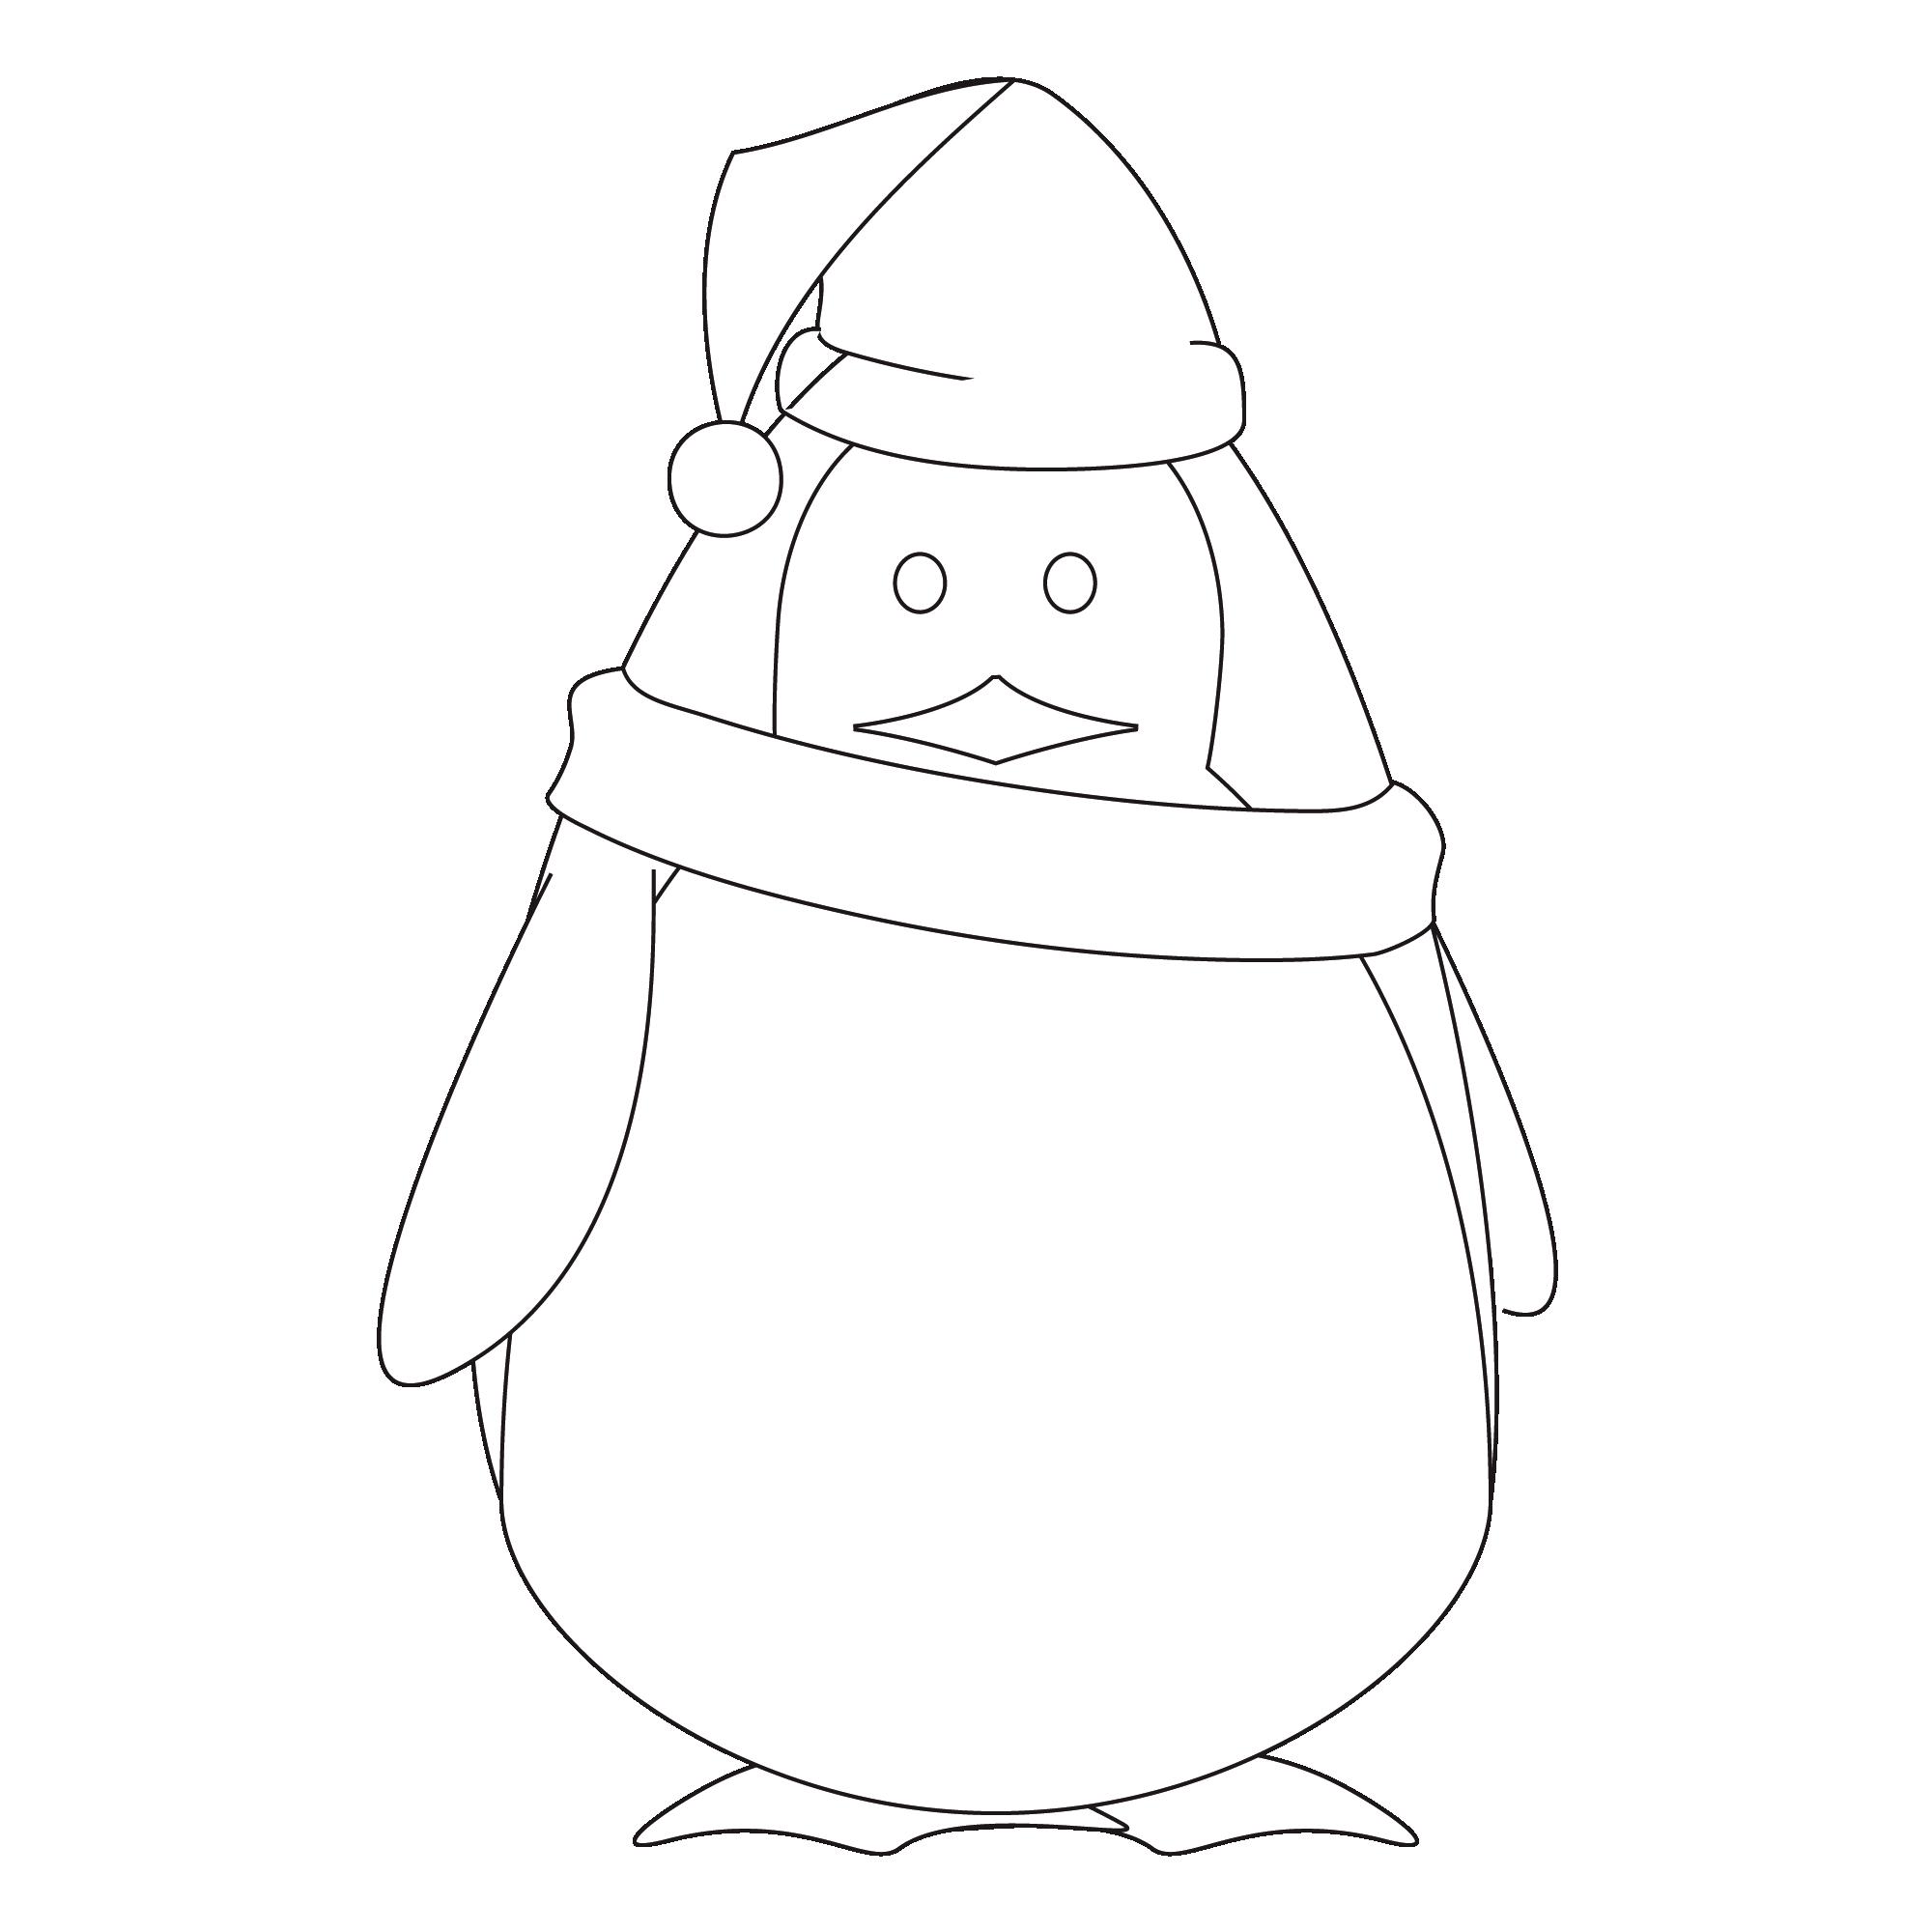 dessin pingouin a imprimer gratuit